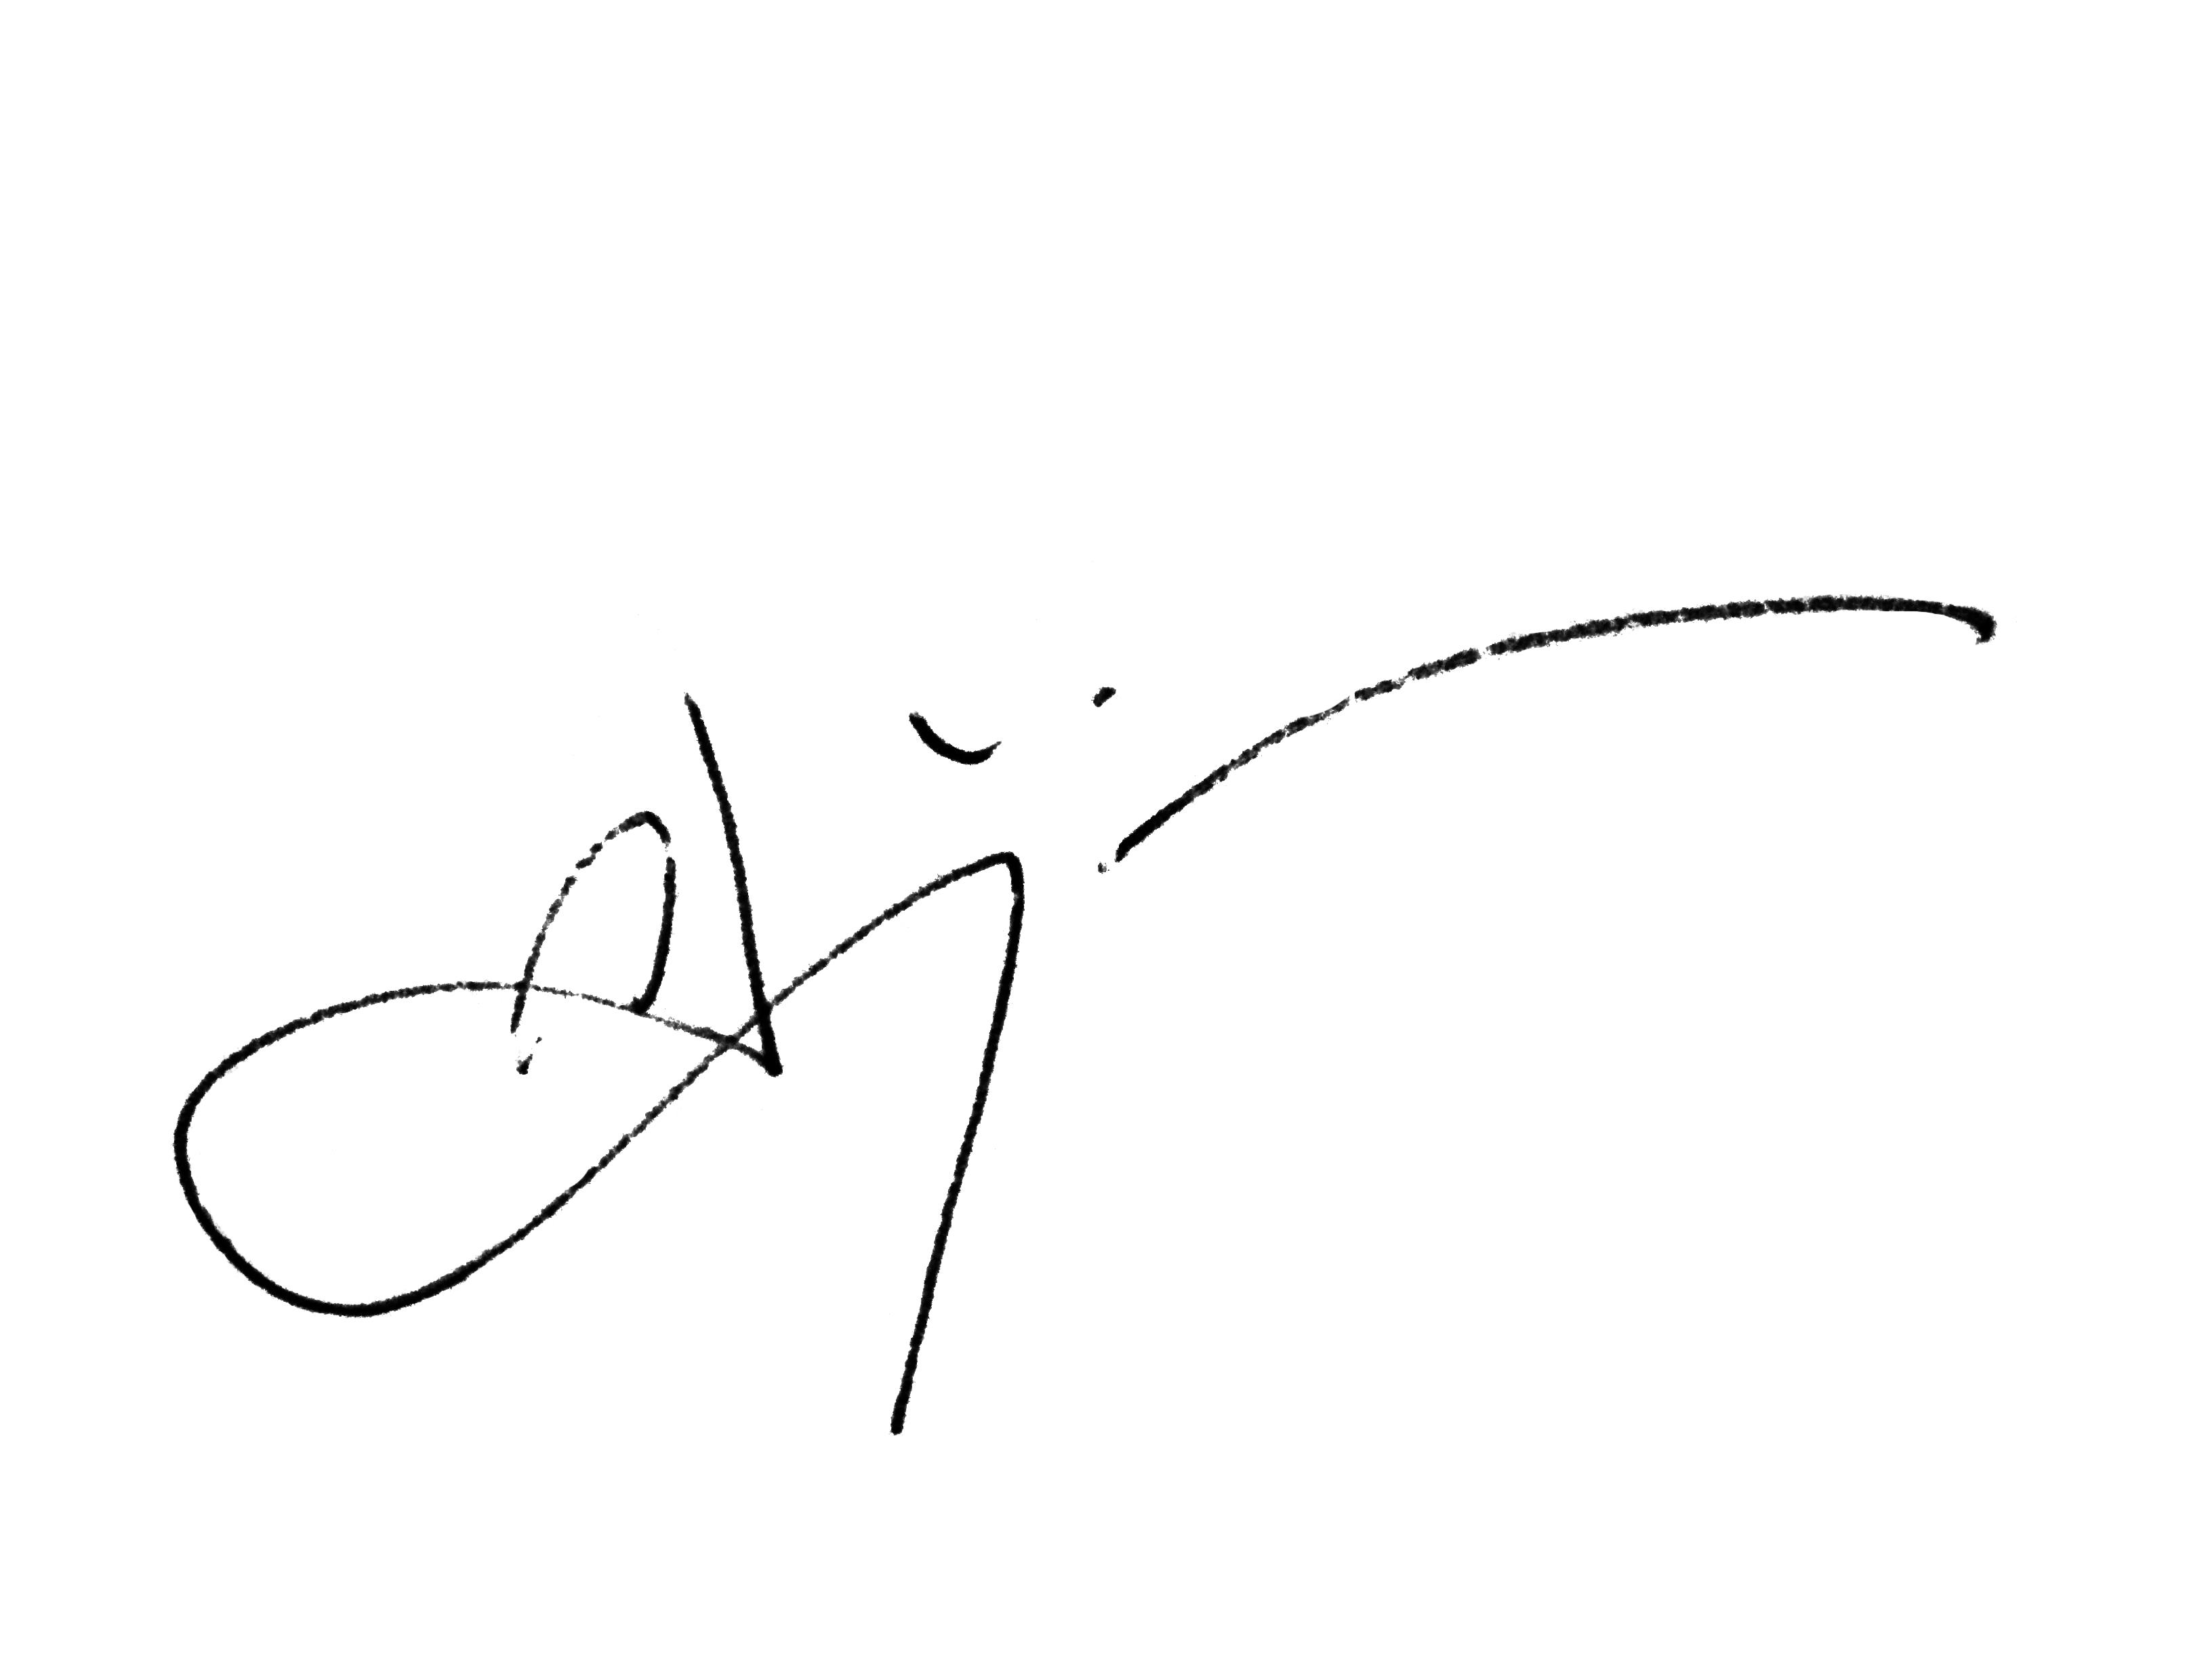 oktay degirmenci Signature